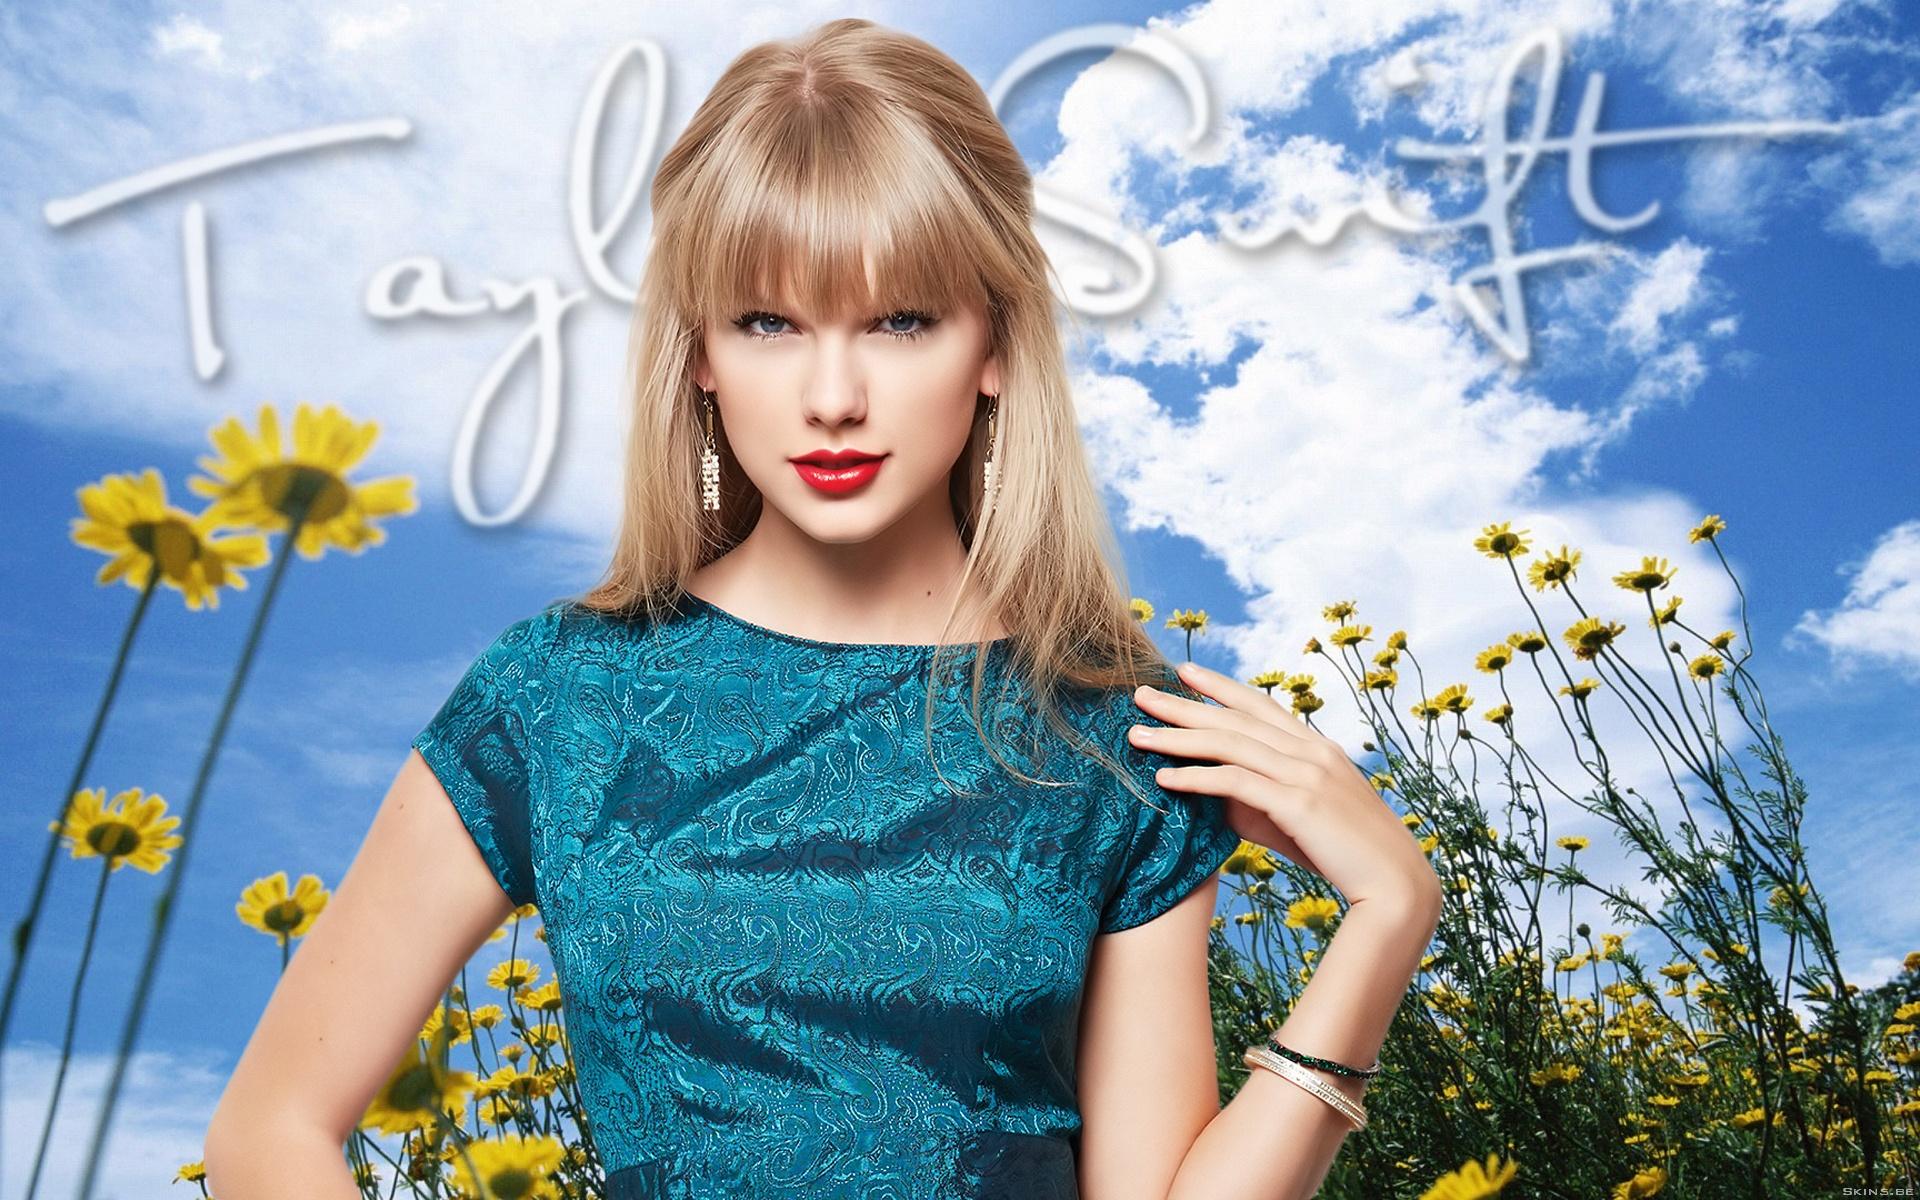 Taylor Swift Wallpaper 13683